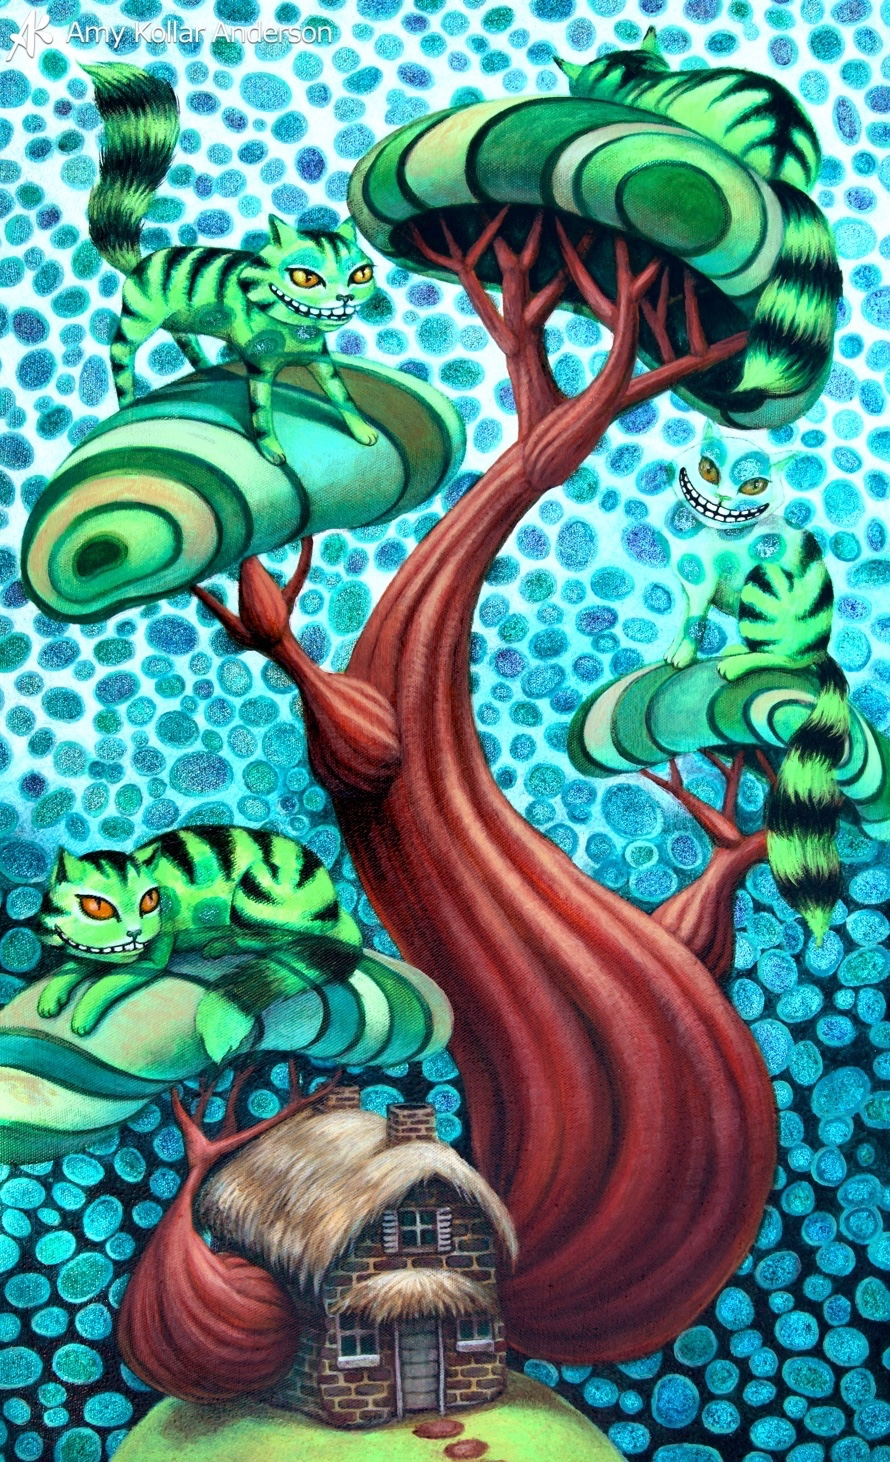 Cheshire_Tree_Kollar_Anderson.jpg